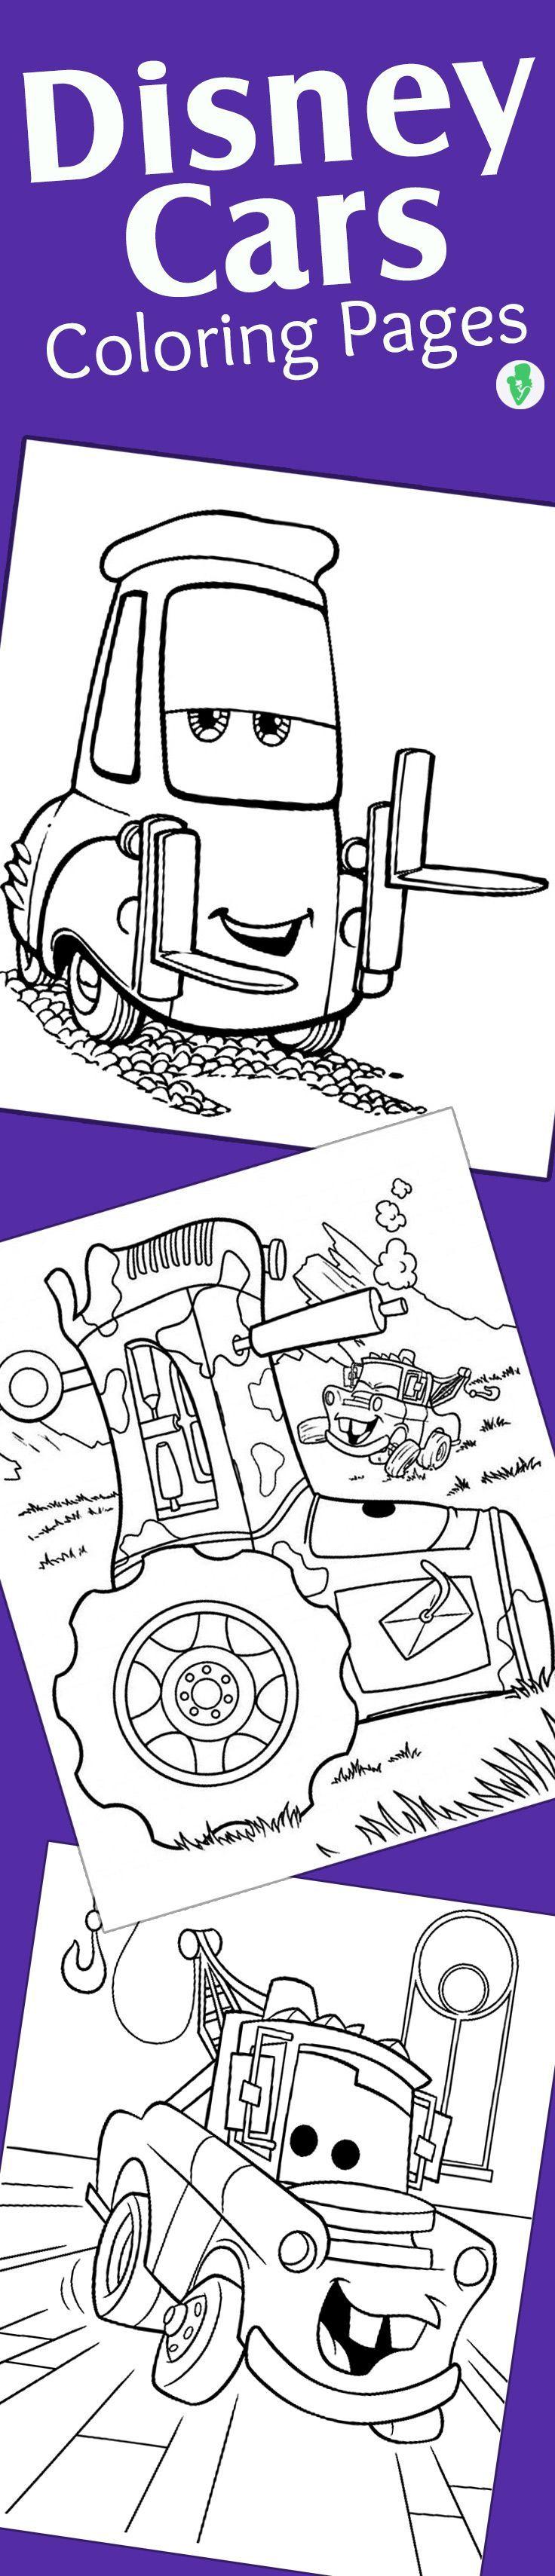 Top 10 Free Printable Disney Cars Coloring Pages Online | Páginas ...